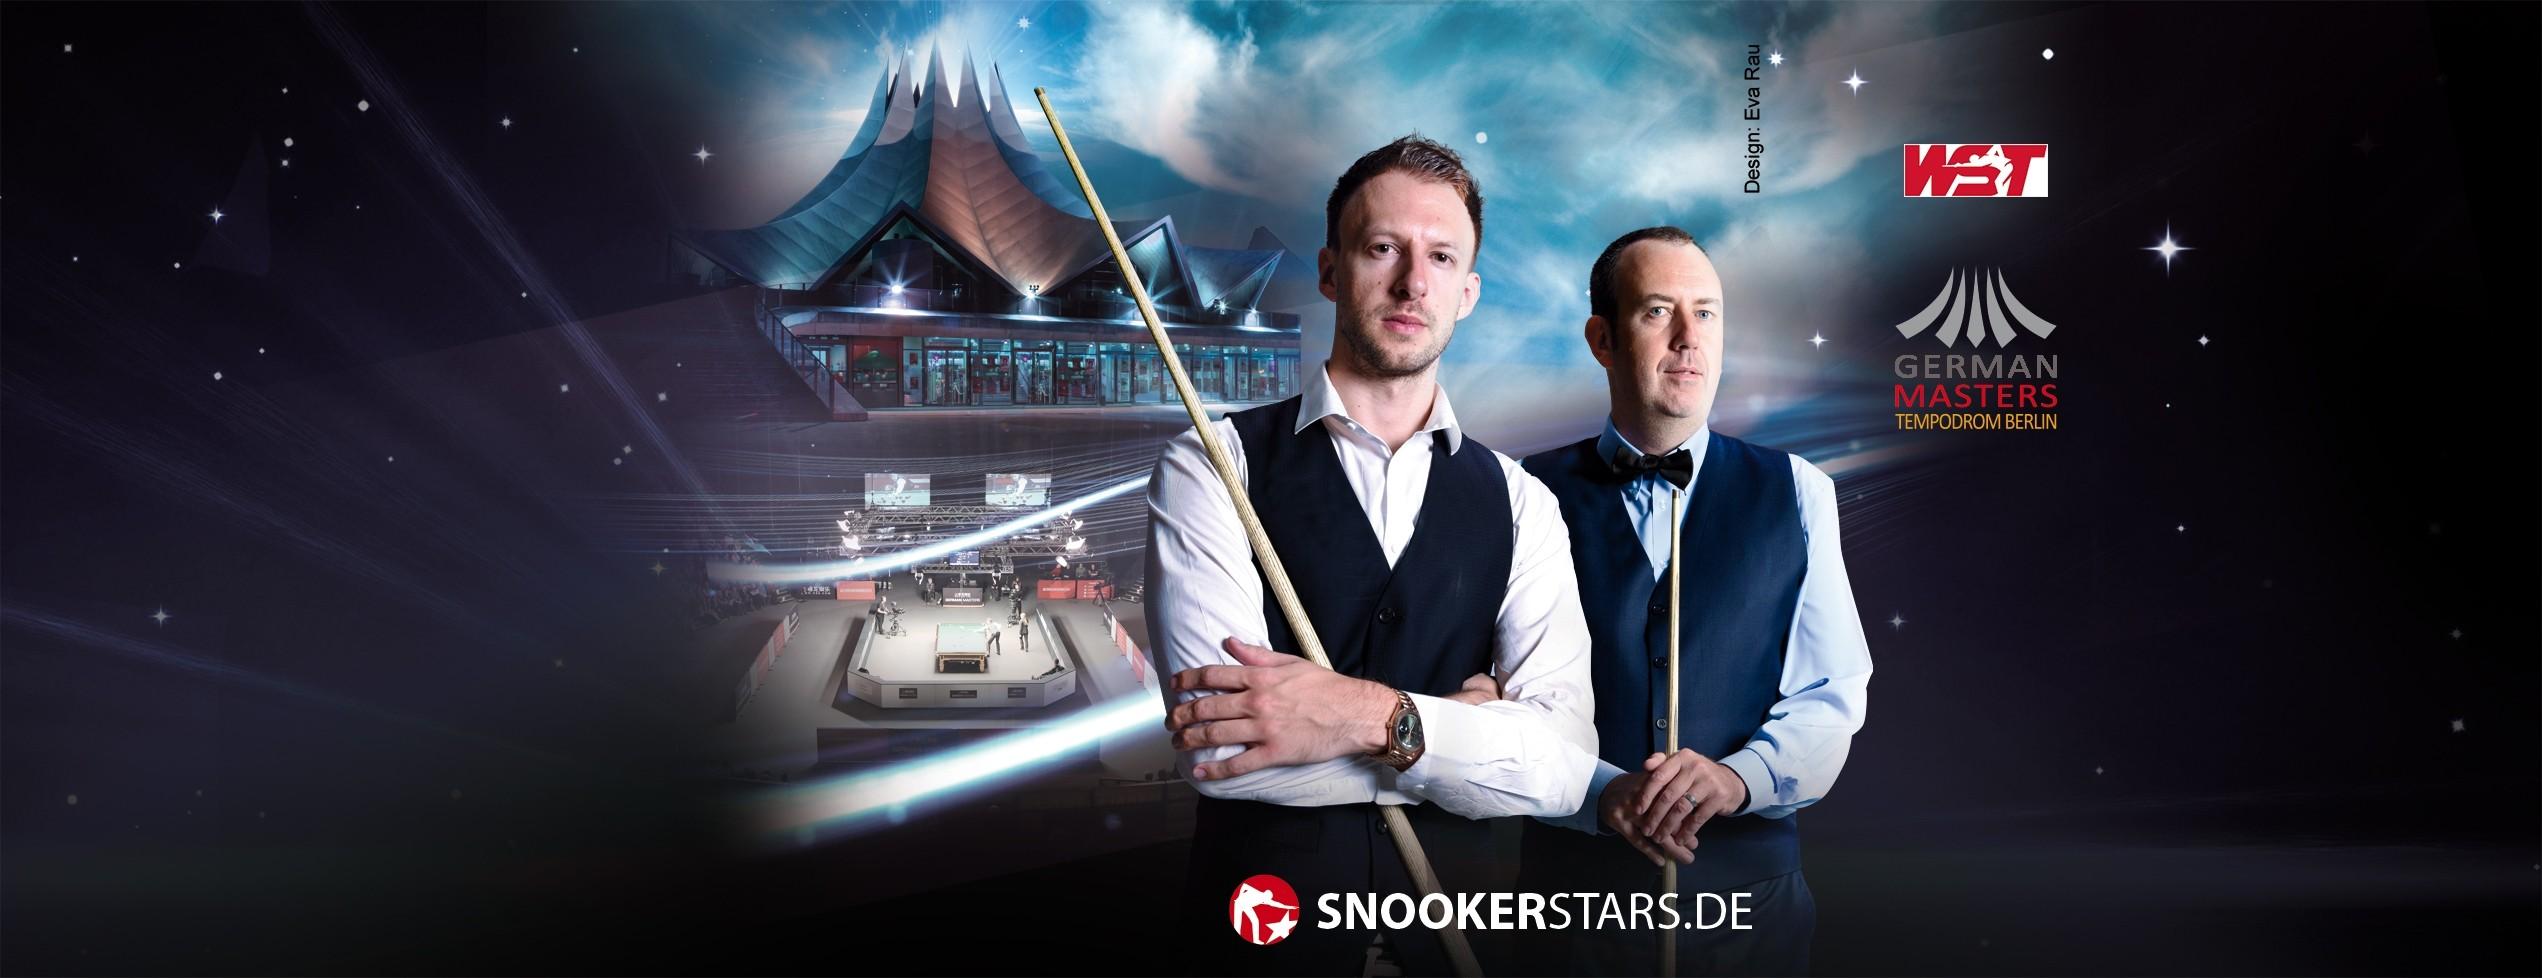 German Masters 29.01.2021 KAT 1 Abend-Session